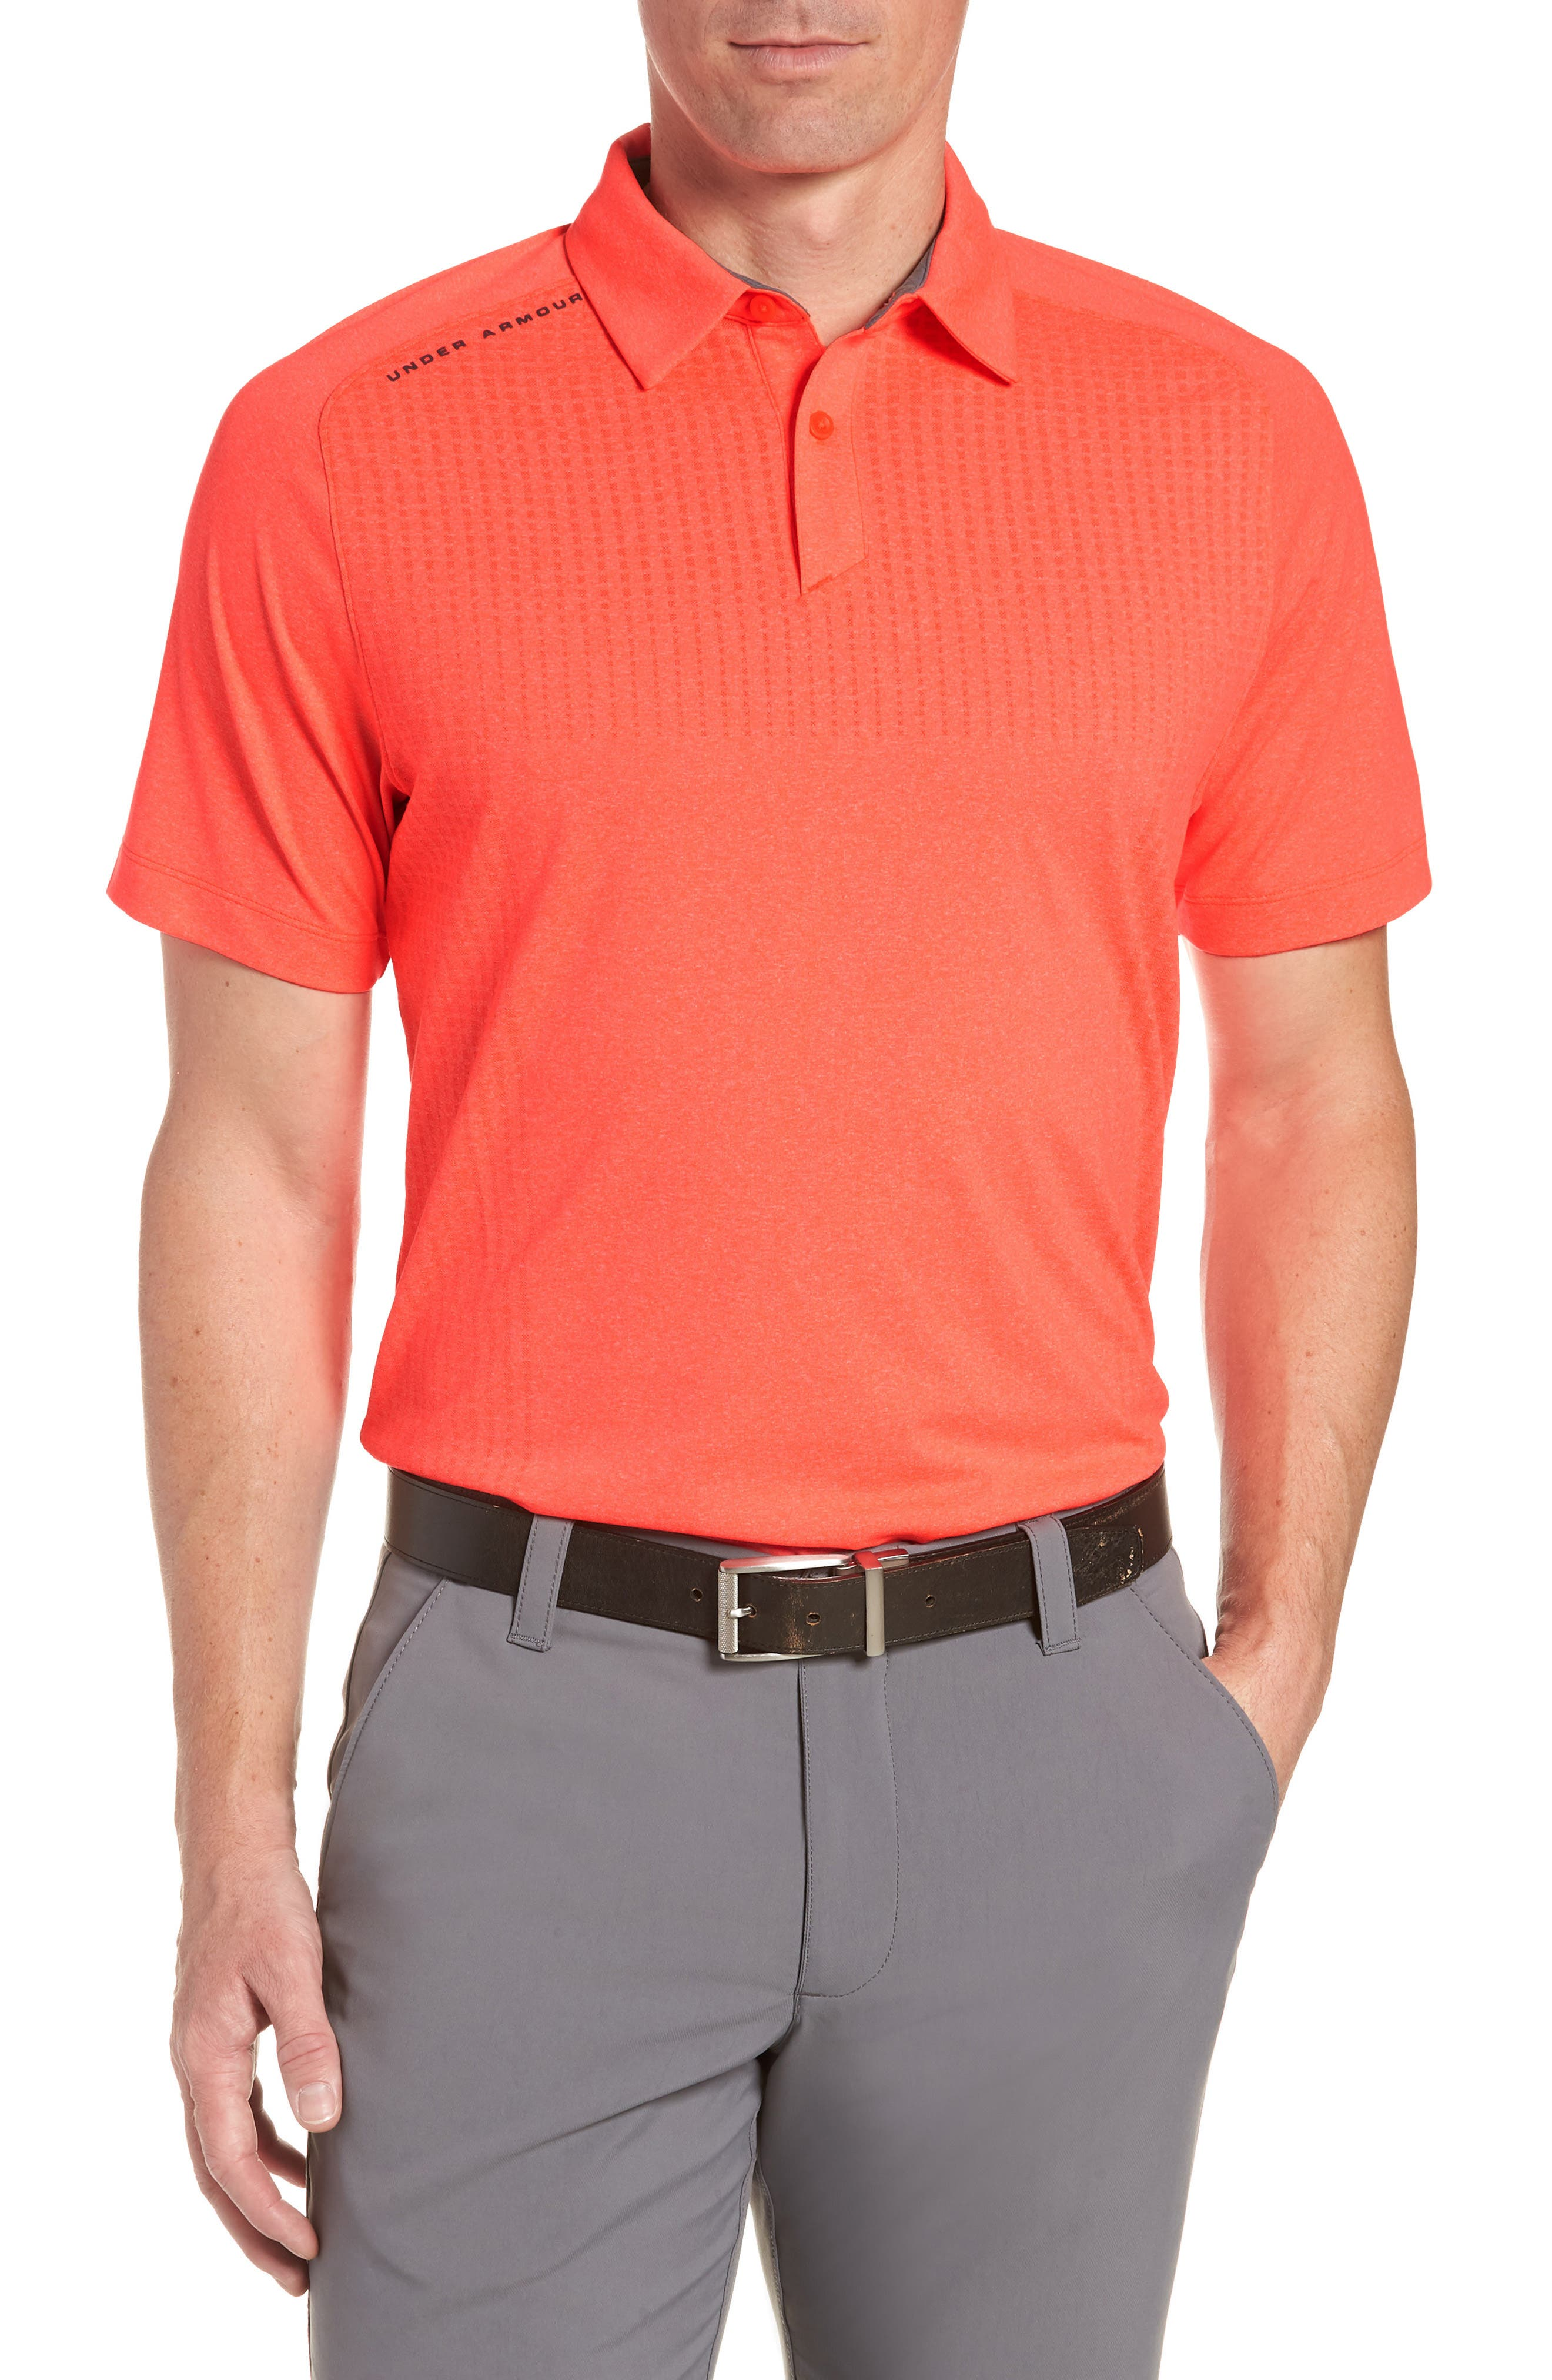 Threadborne Outer Glow Regular Fit Polo Shirt,                             Main thumbnail 1, color,                             986 Nen Crl Lght Hthr Rno Gry